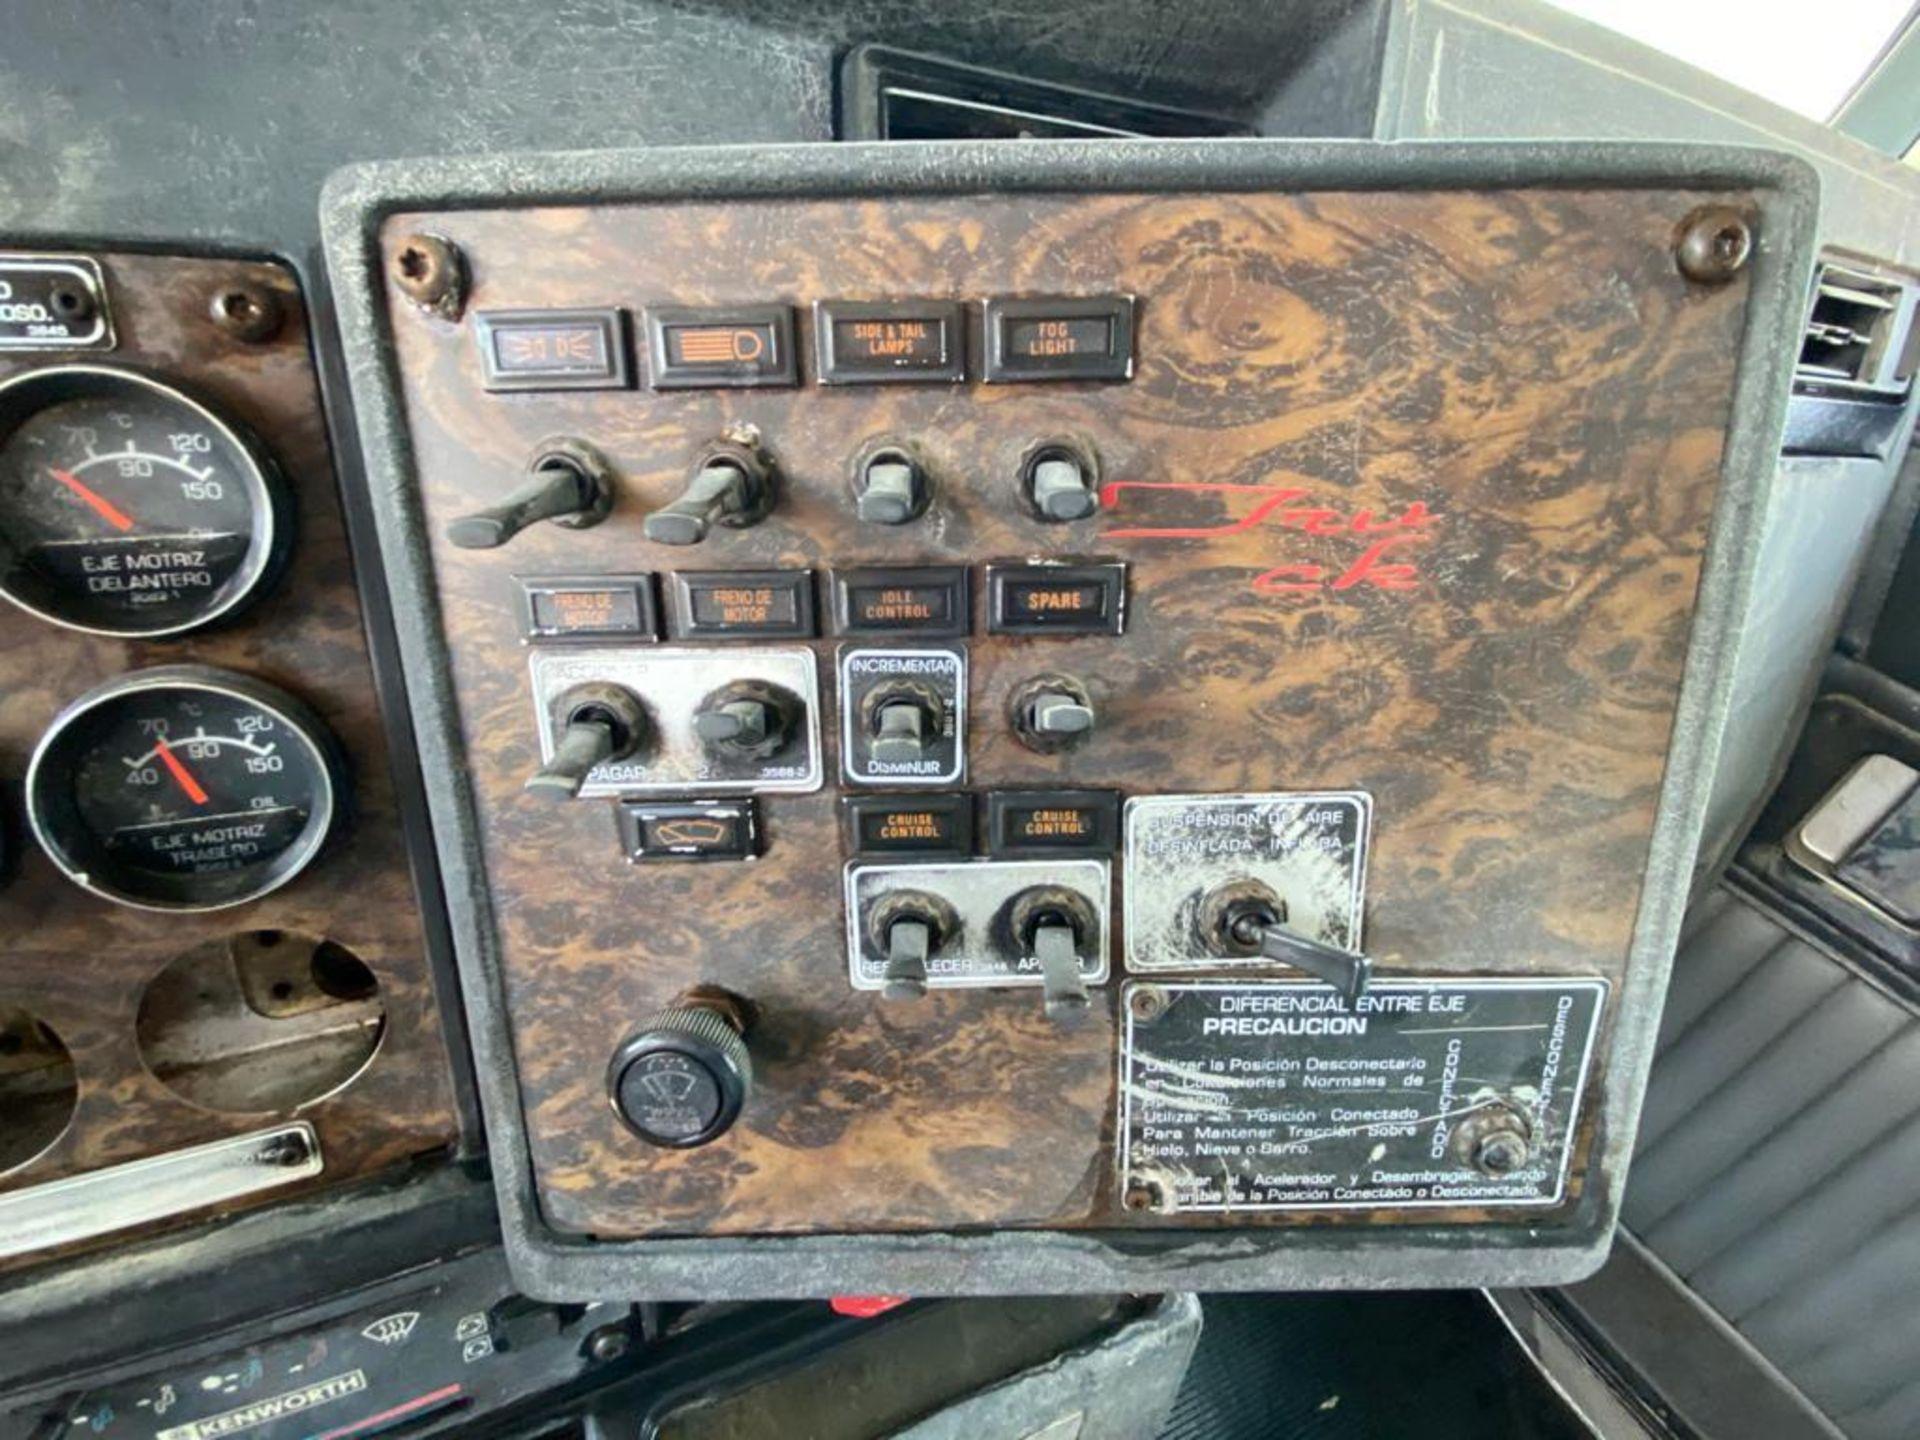 1998 Kenworth 5000 Gallon, standard transmission of 16 speeds - Image 29 of 68